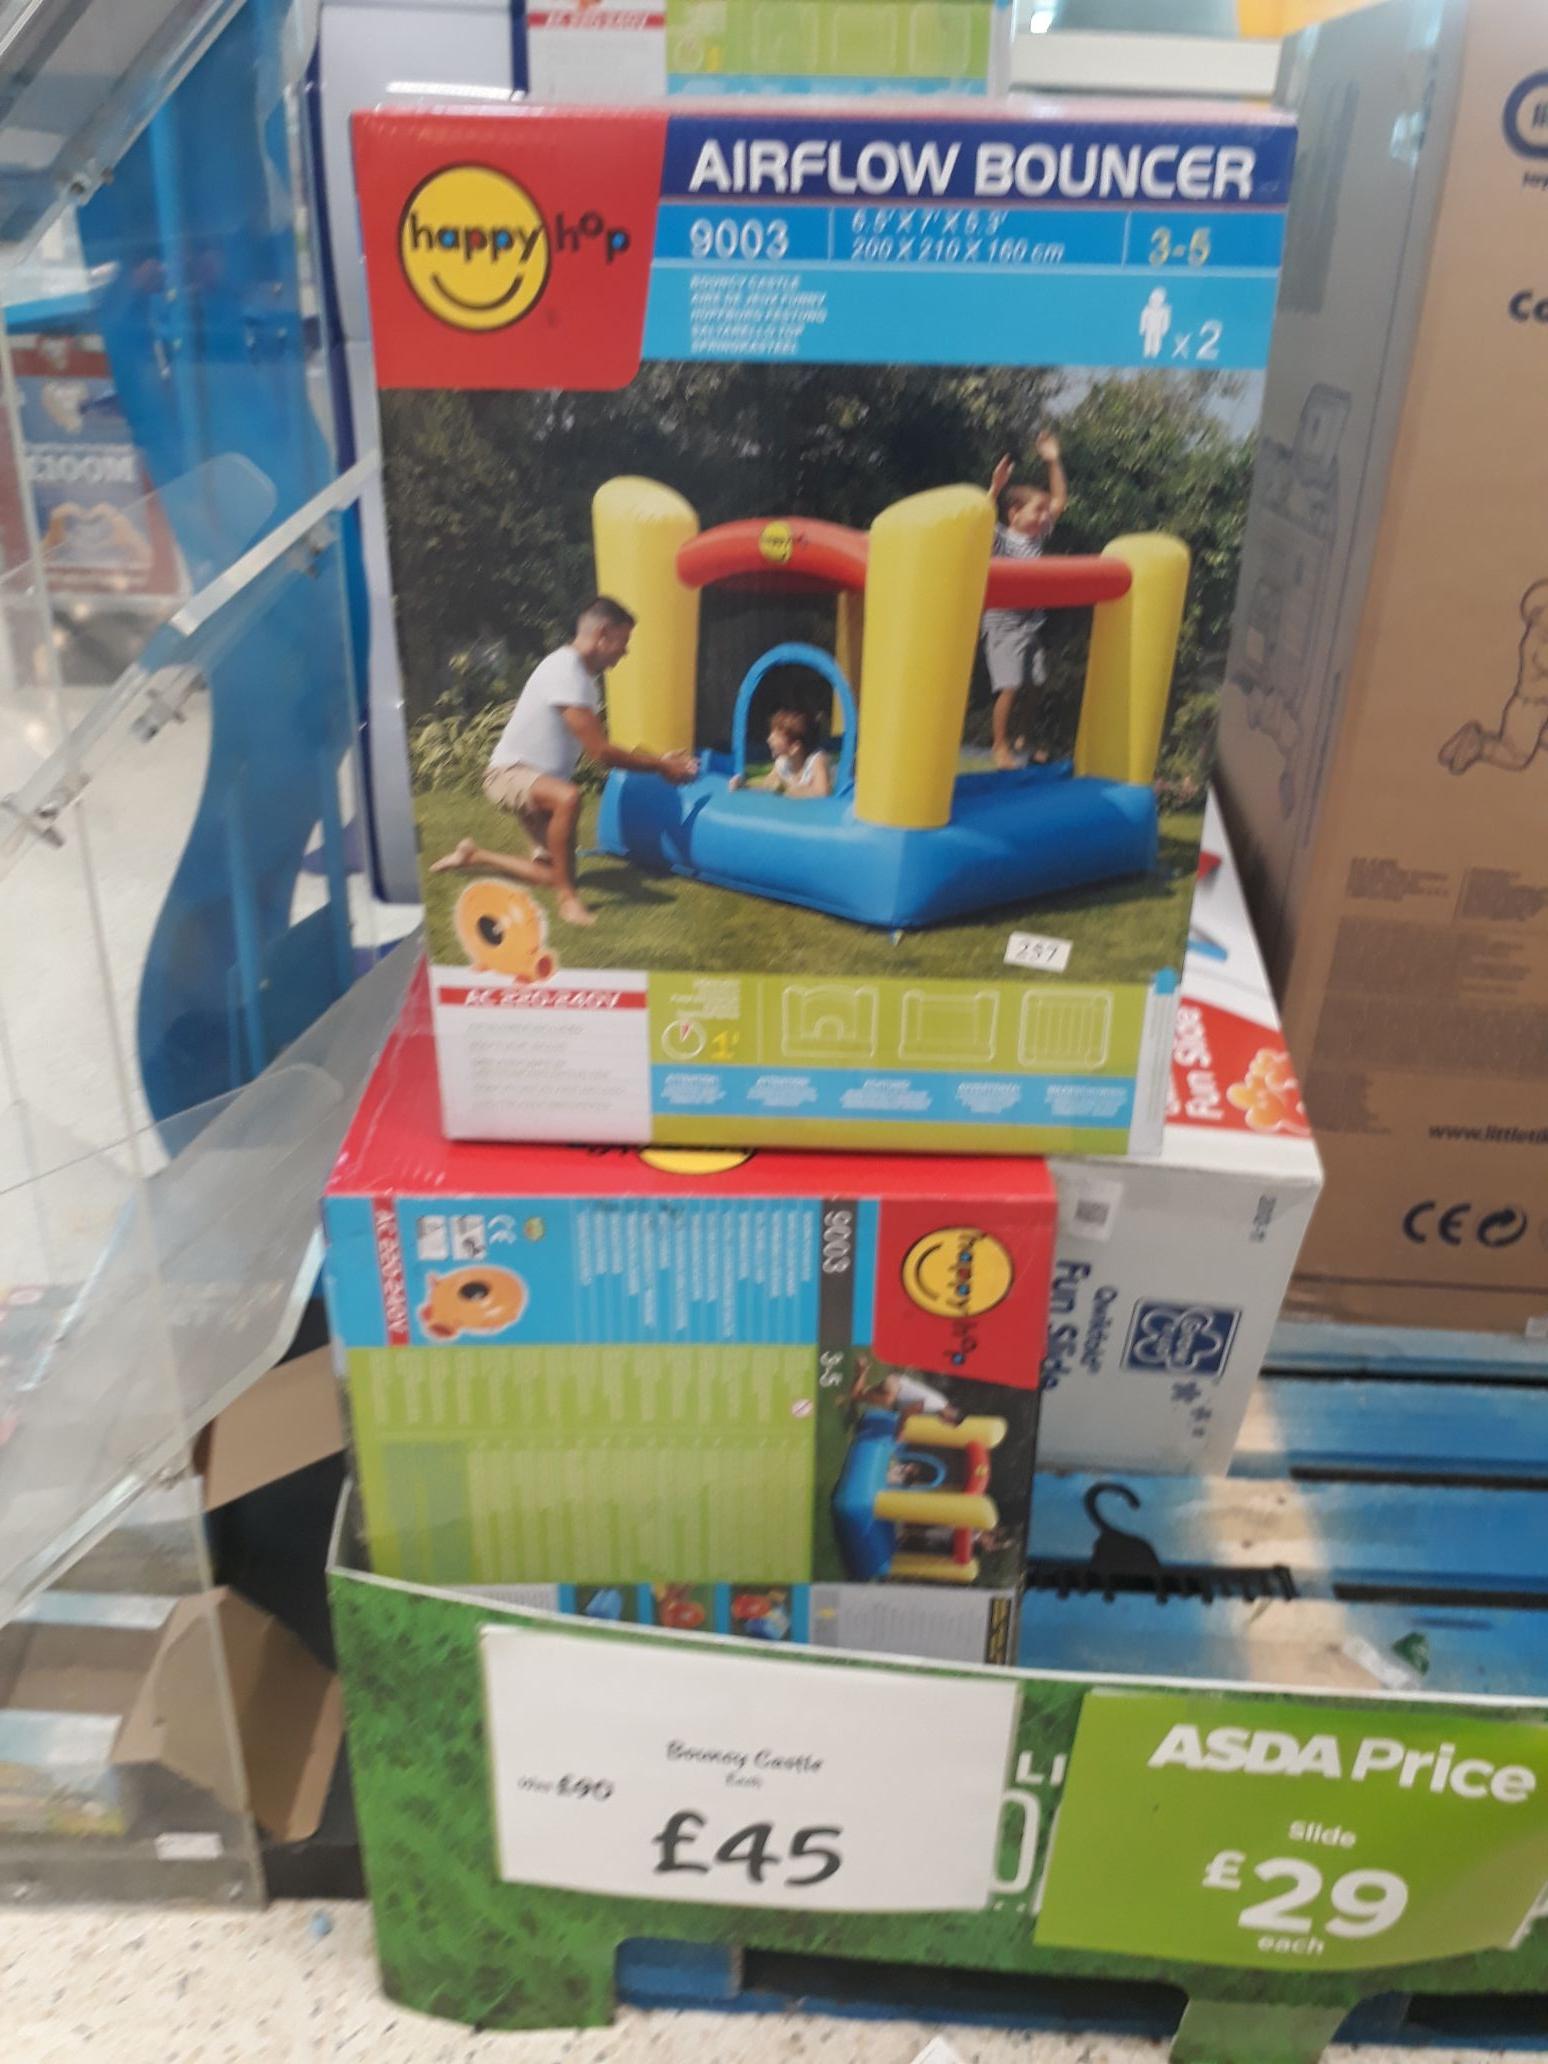 Bouncy castle at asda. Half price - £45 instore